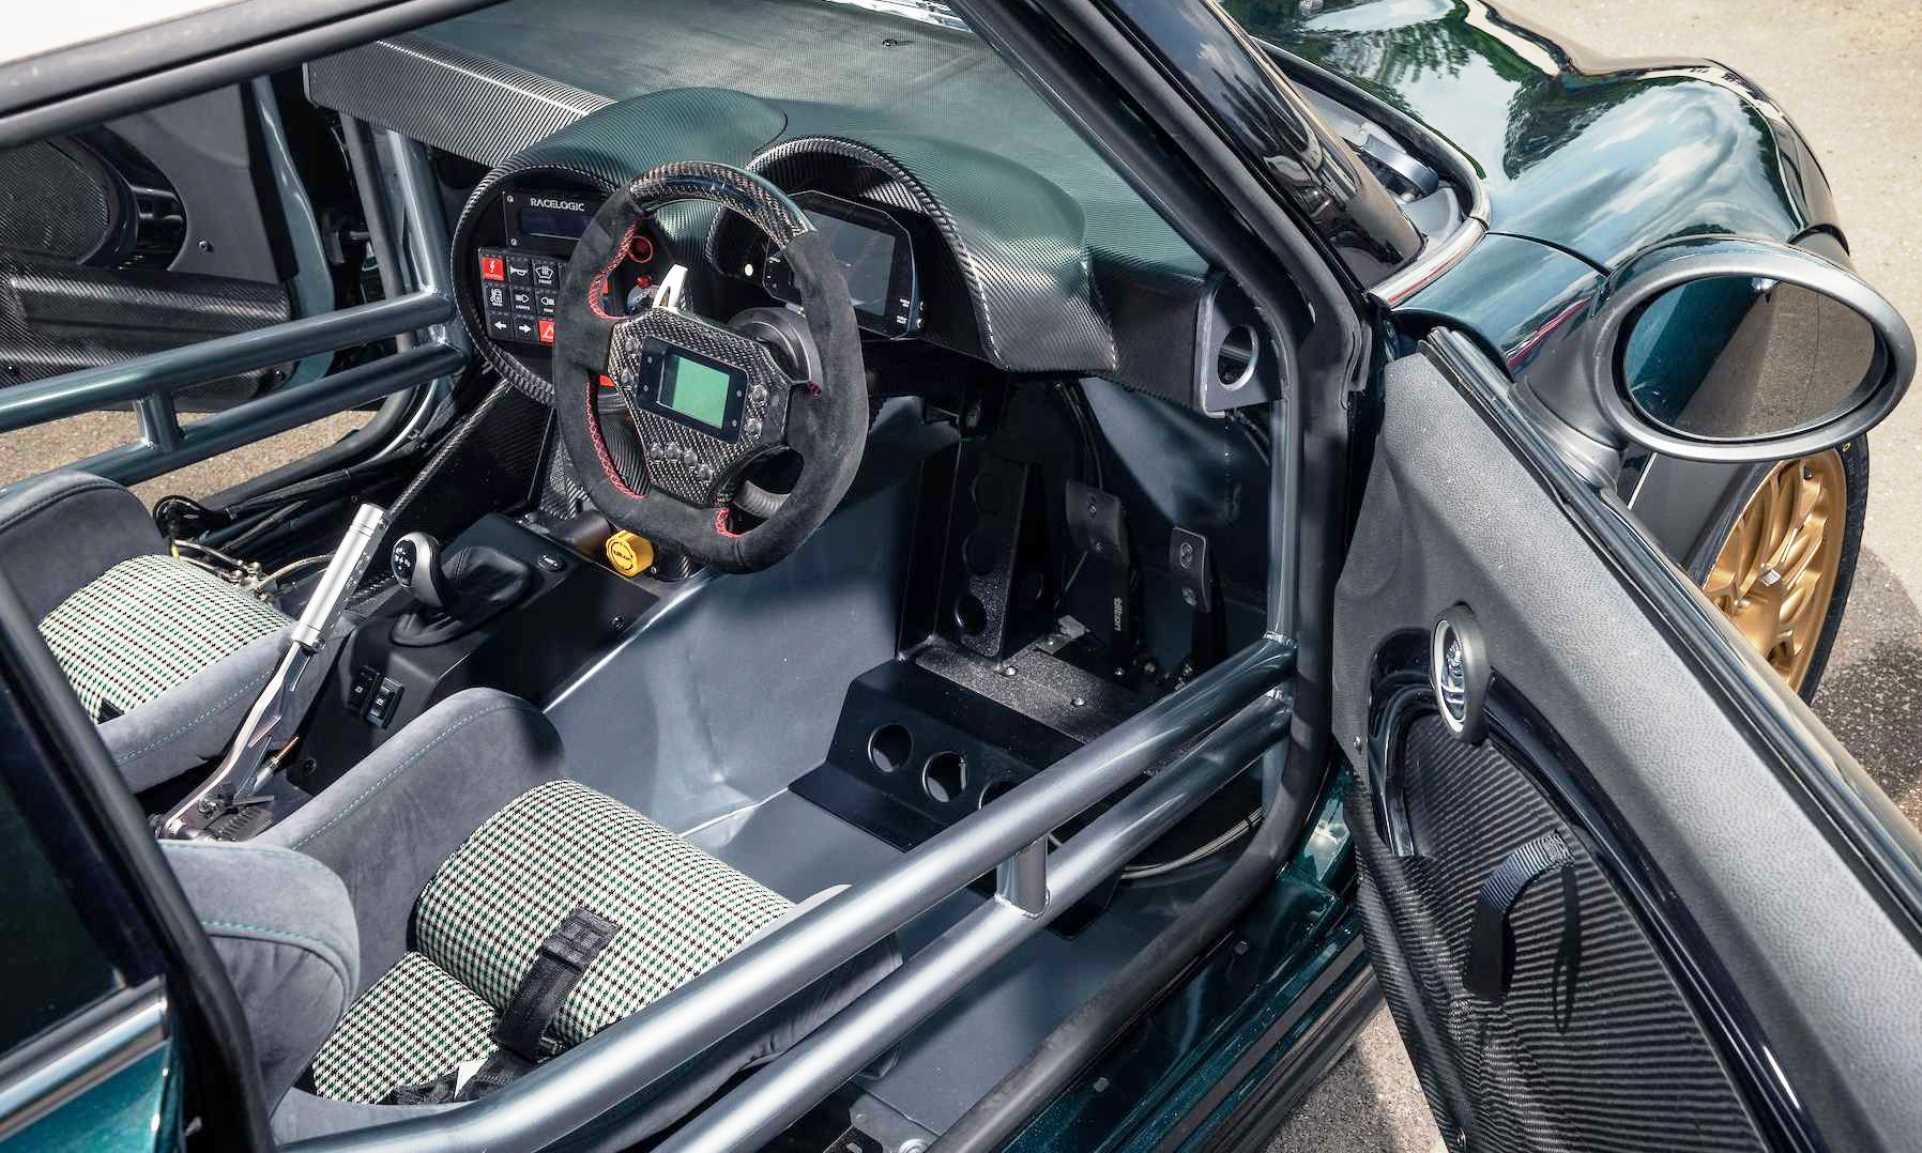 BMW V8-Engined Mini interior